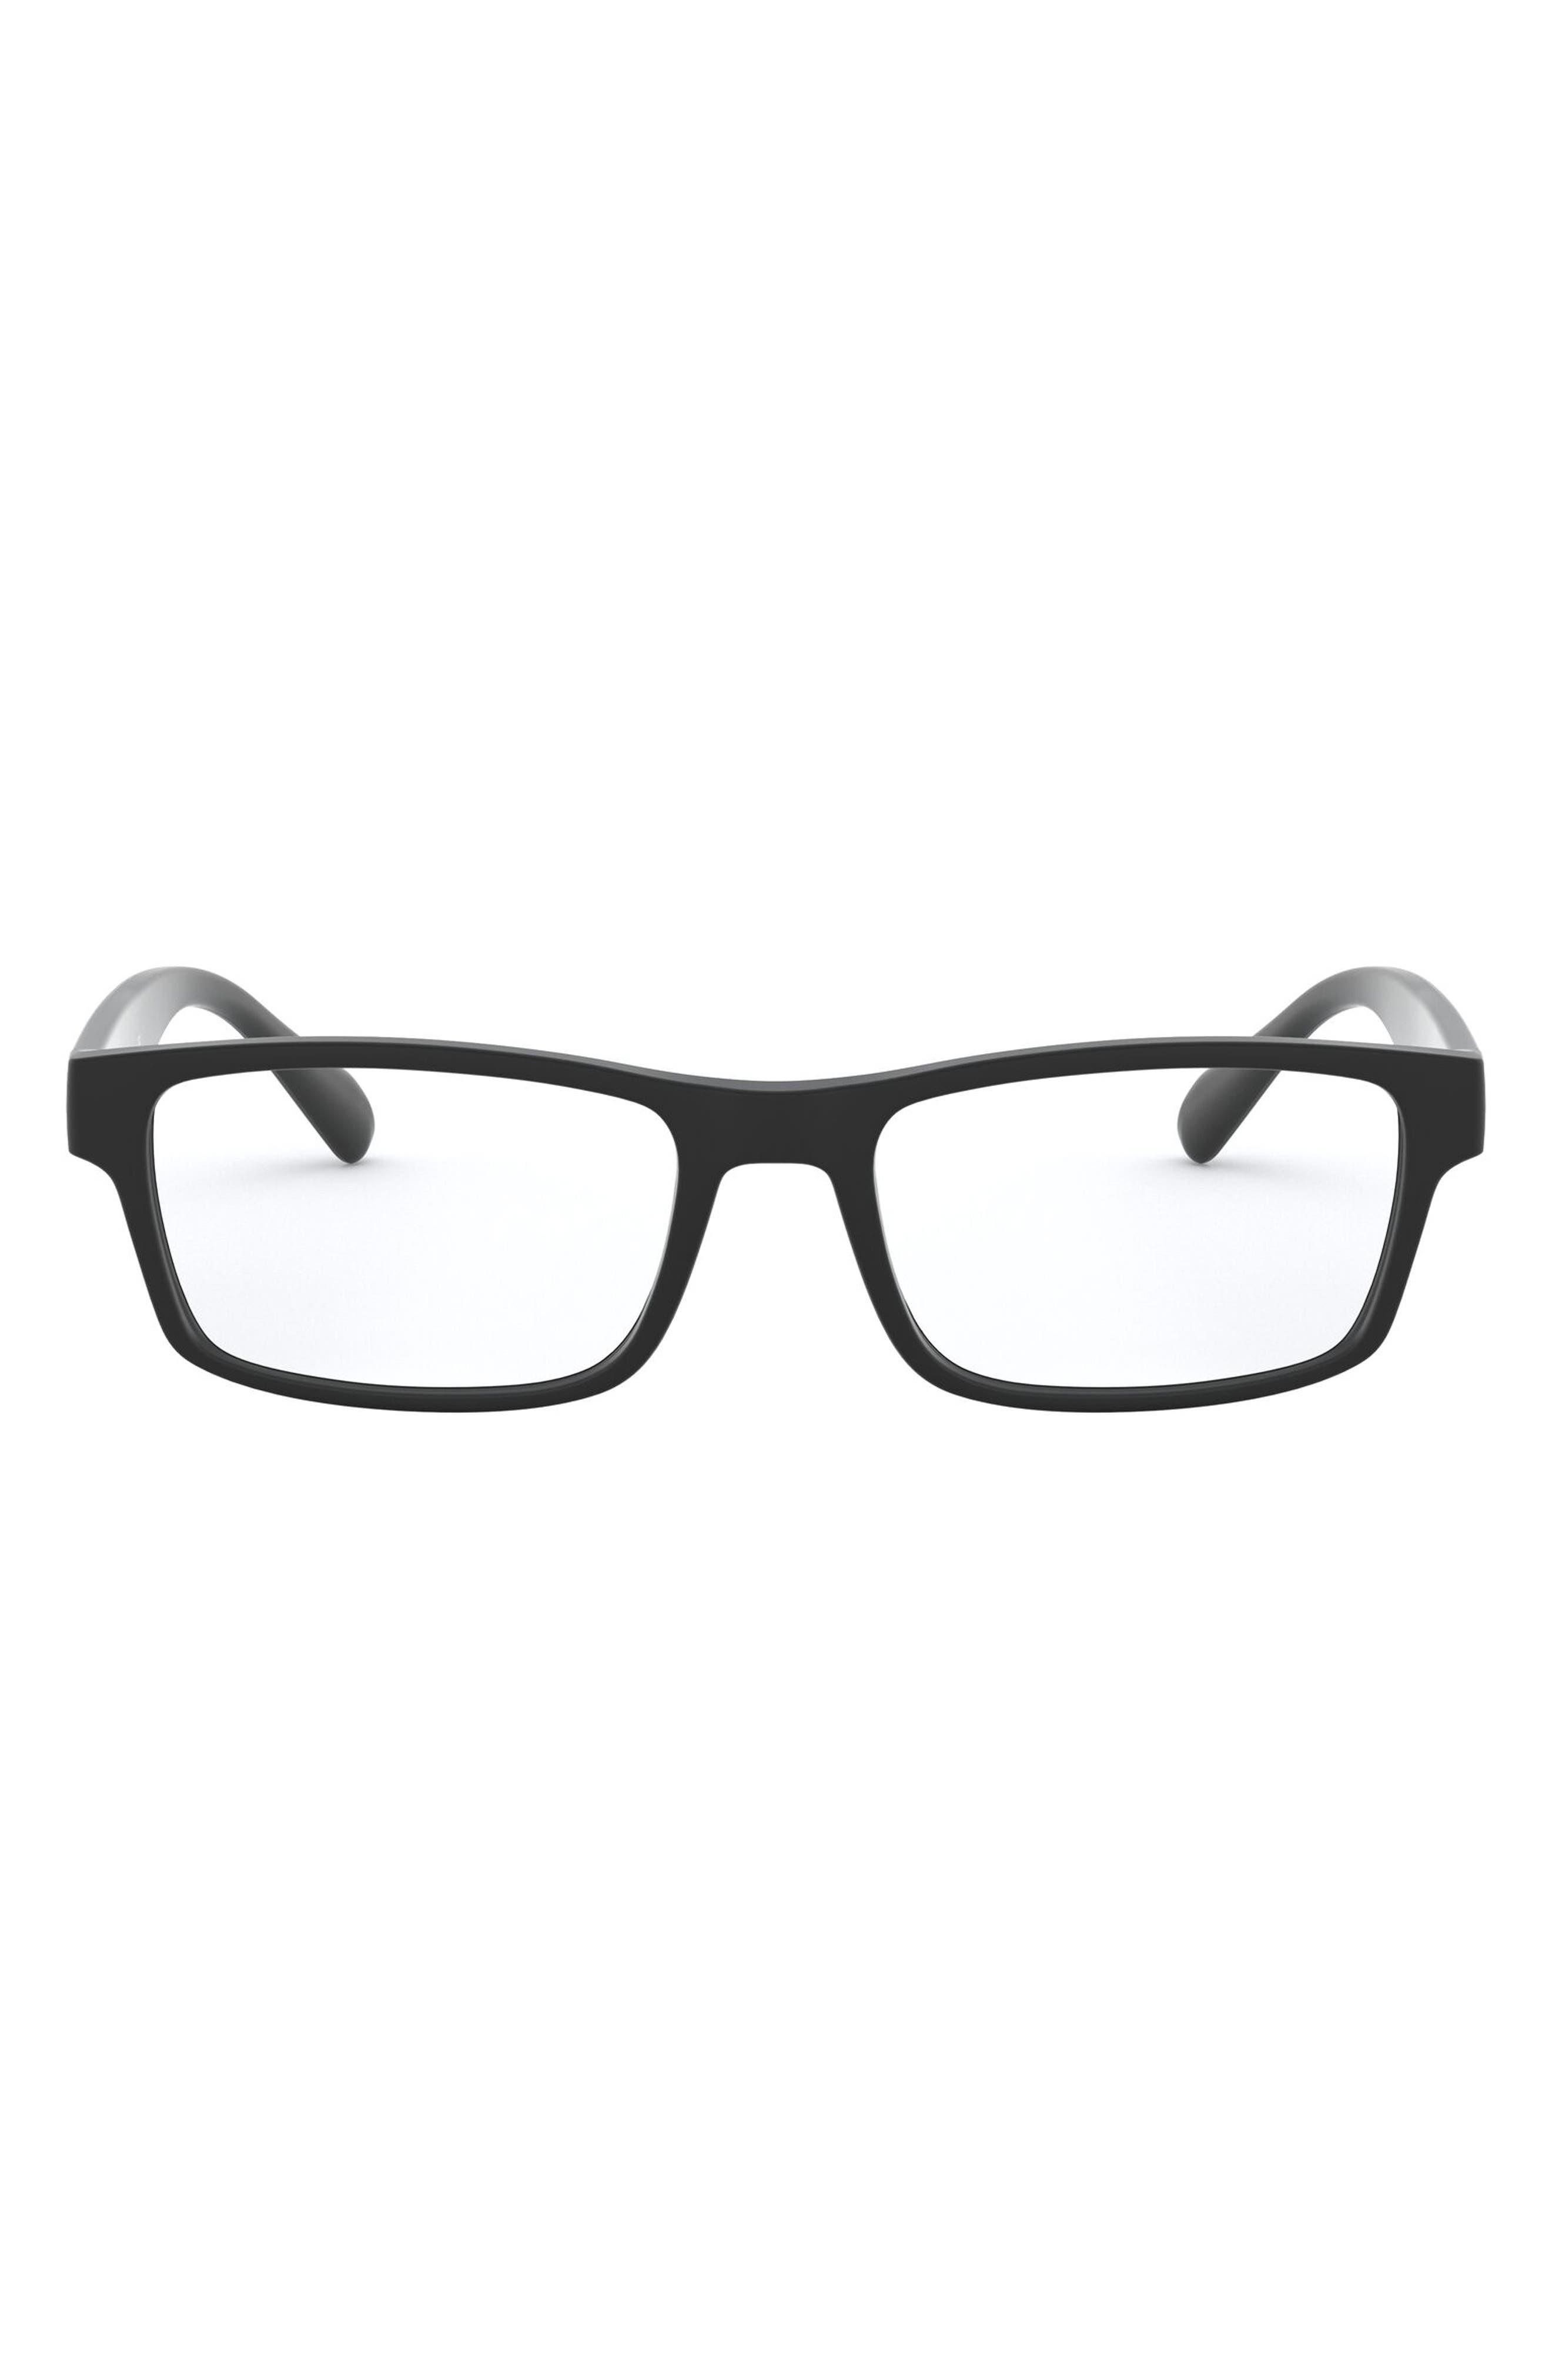 55mm Rectangular Optical Glasses